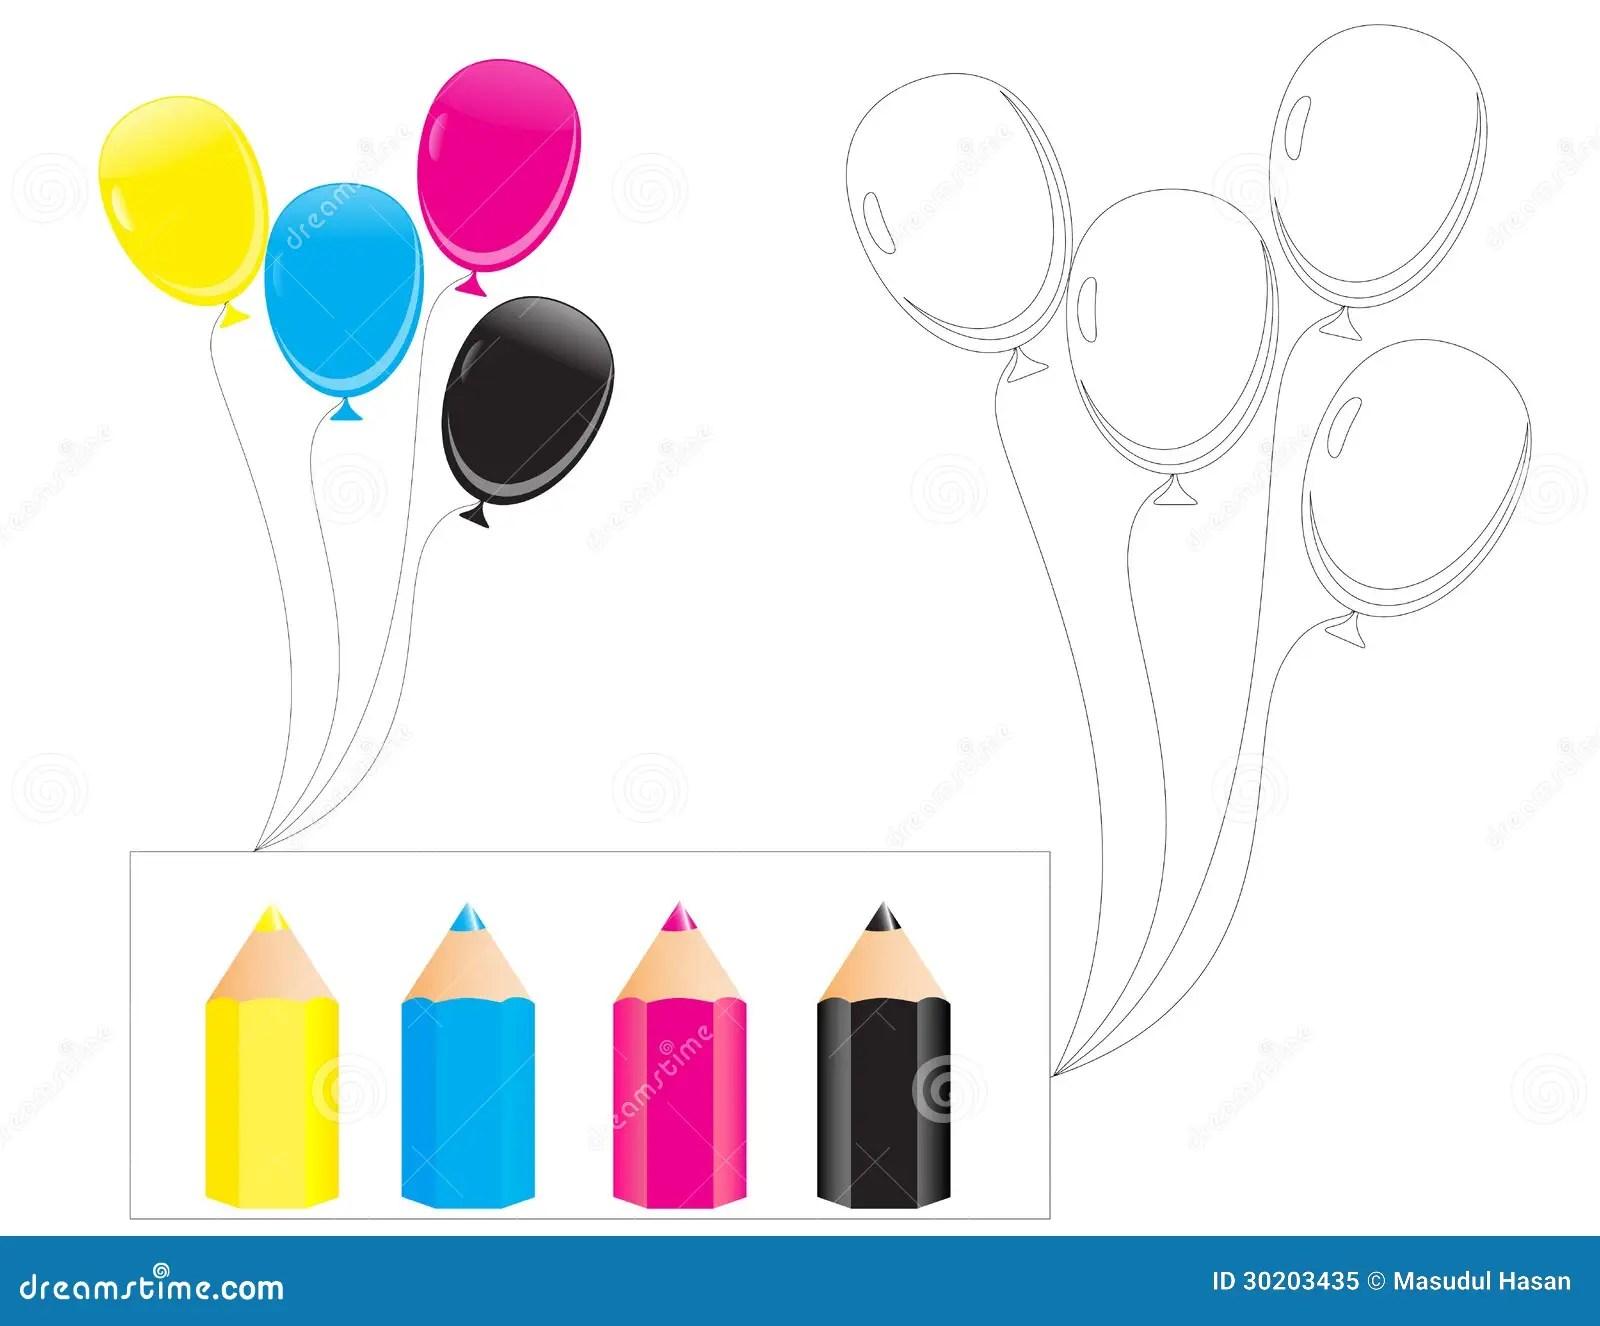 B For Balloon Royalty Free Stock Photo Image 30203435